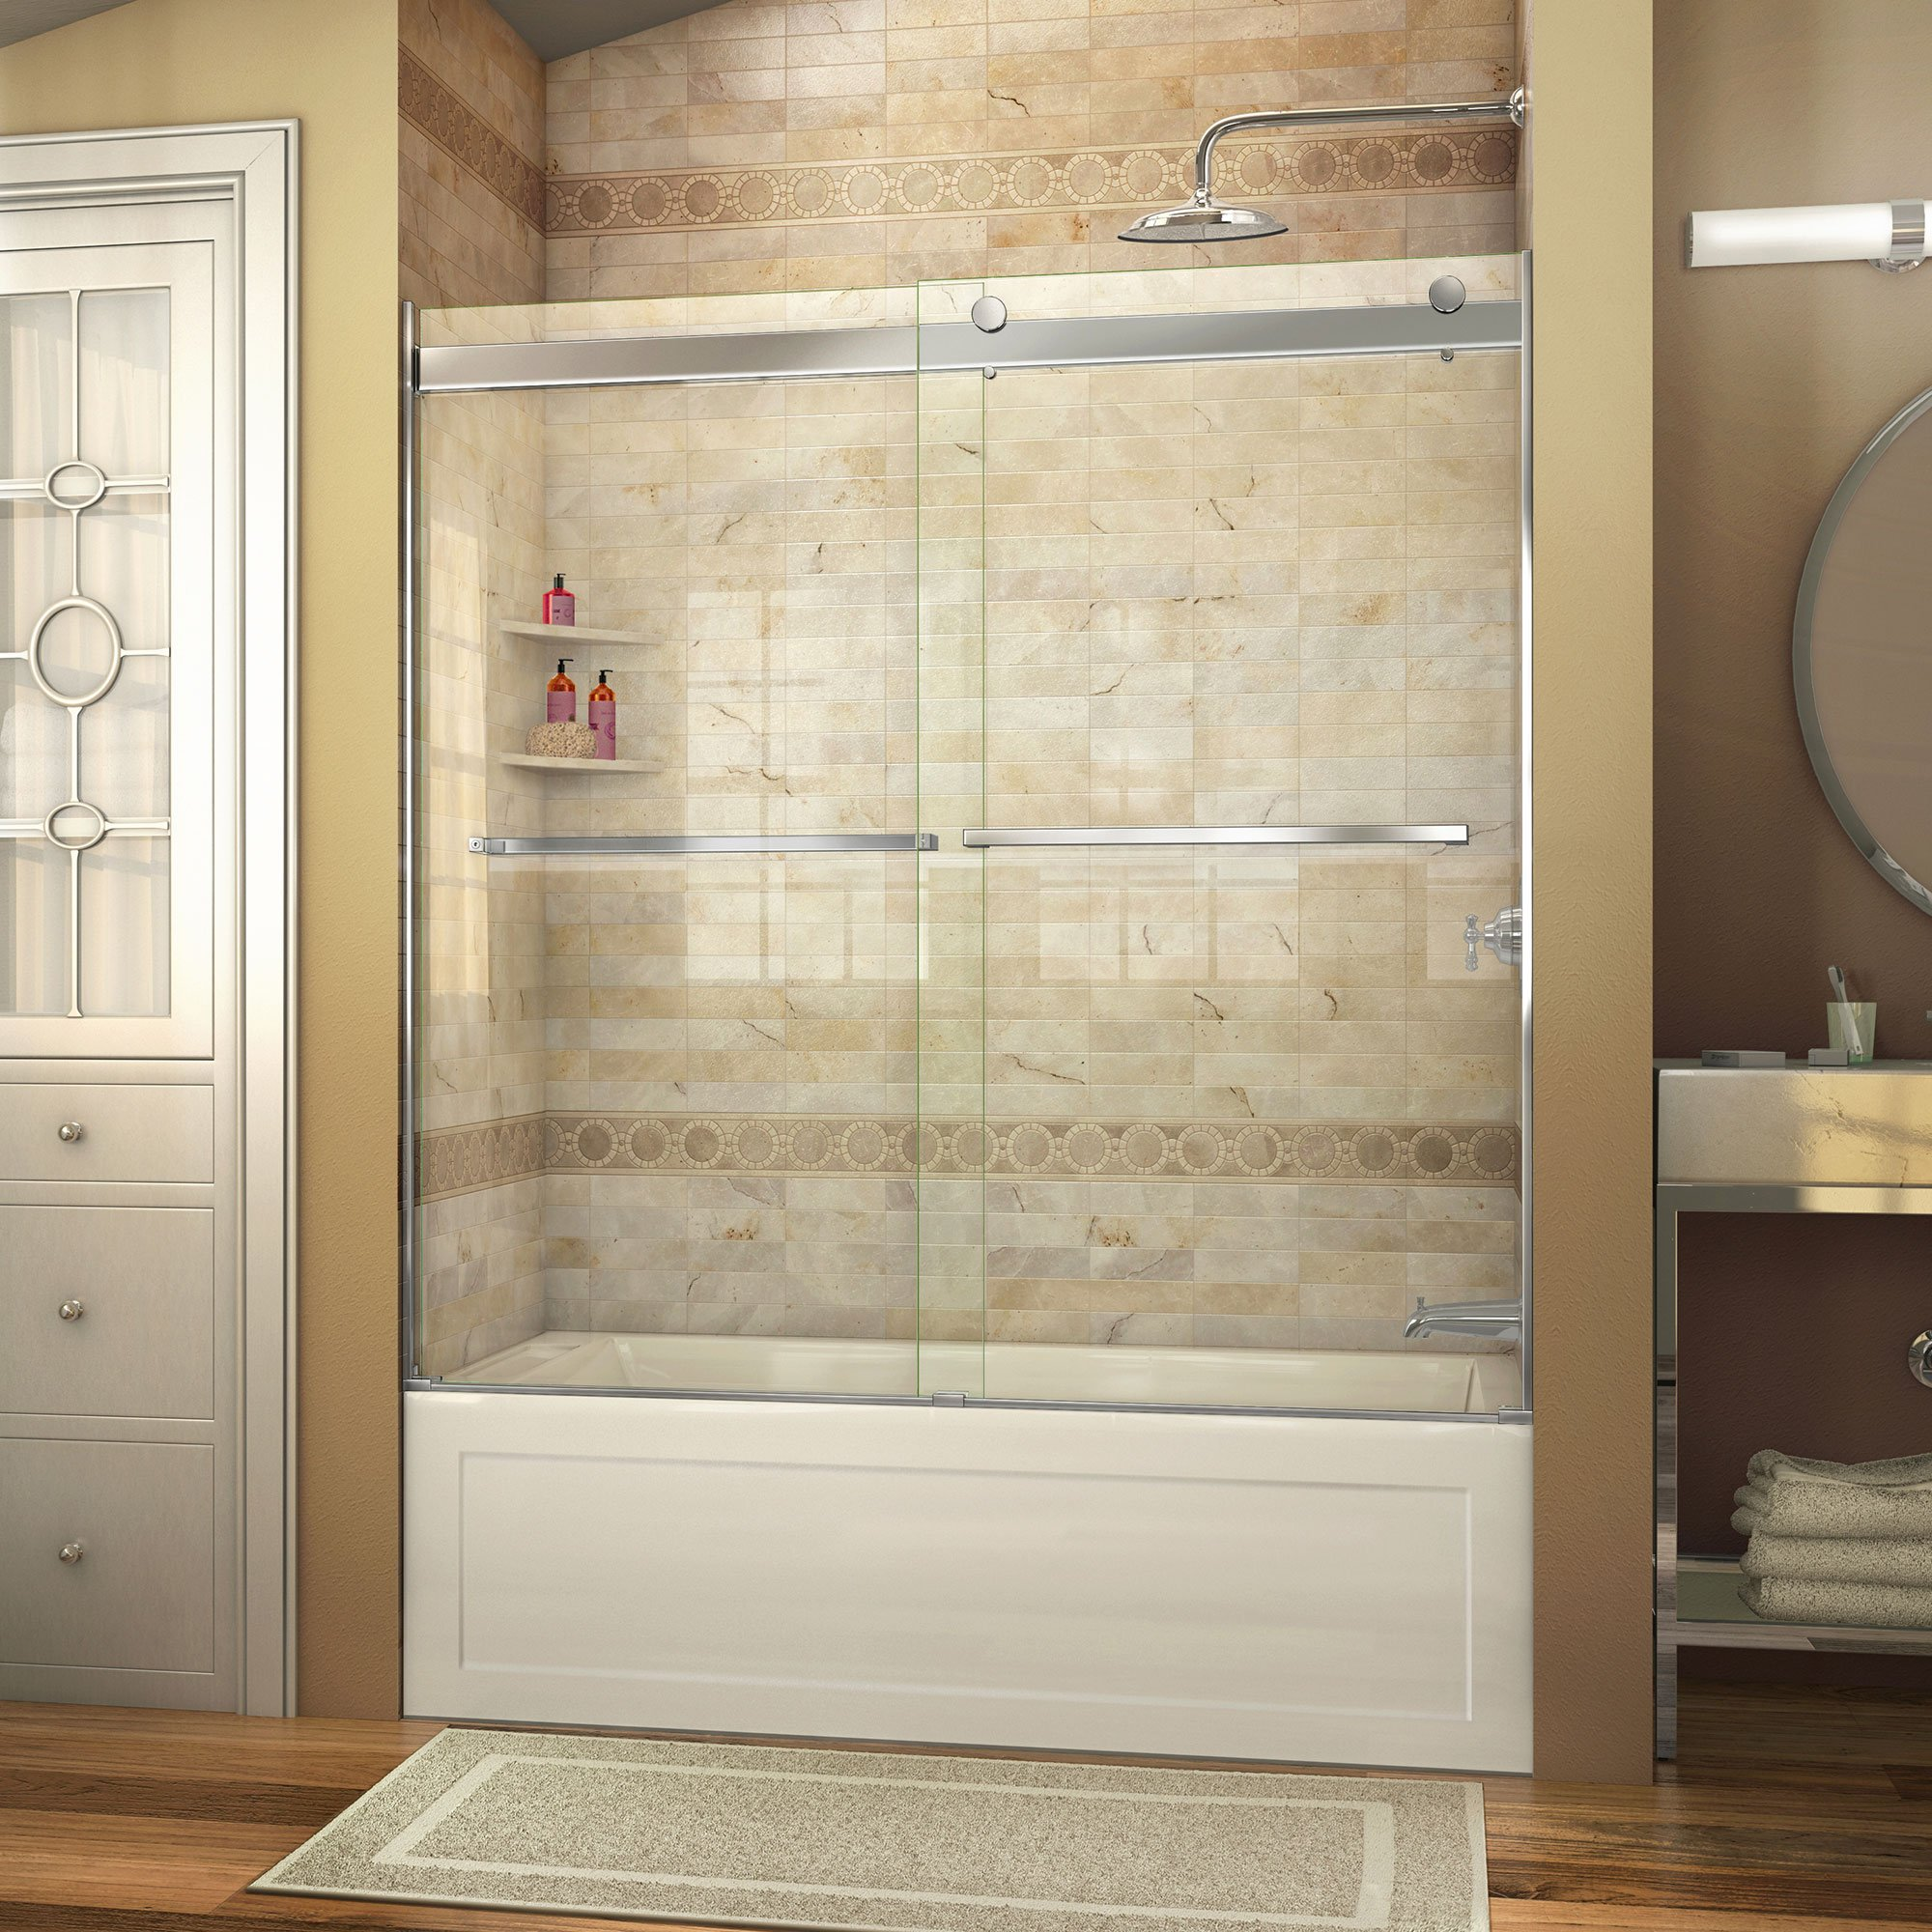 DreamLine Essence 56-60 in. W x 60 in. H Frameless Bypass Tub Door in Chrome, SHDR-6360600-01